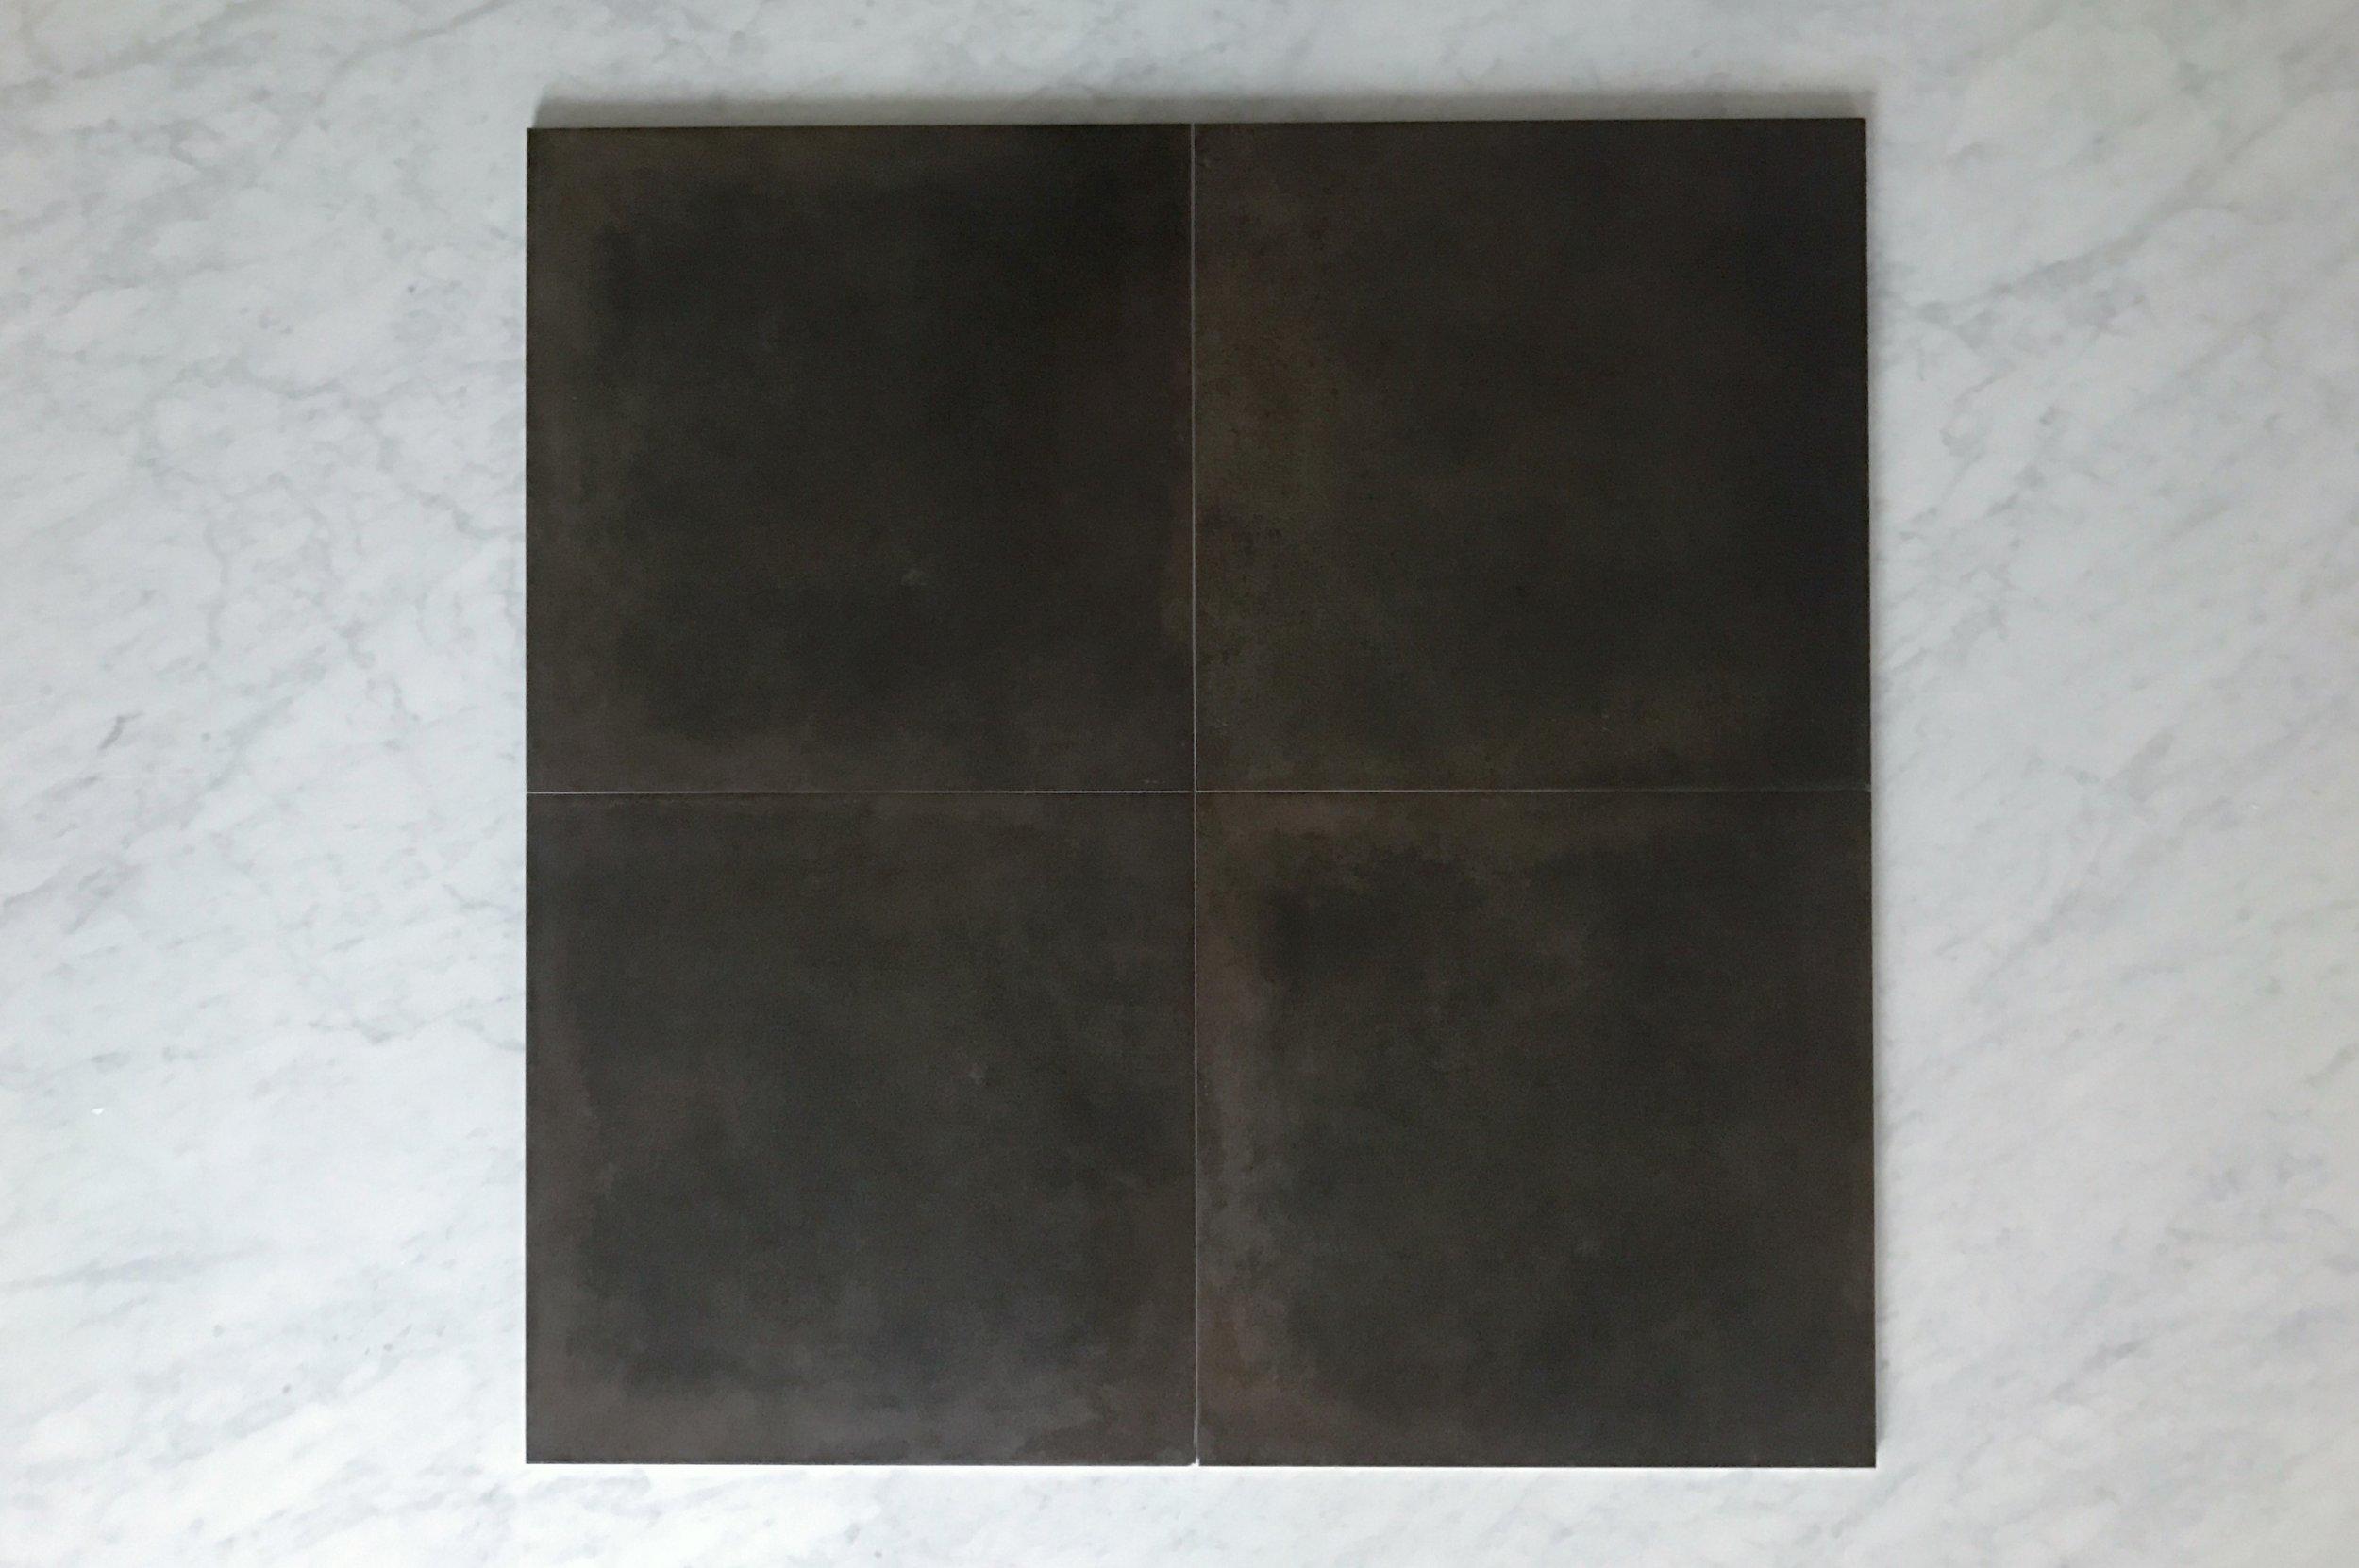 Sichenia Bronzo 18x18 Semi-Polished